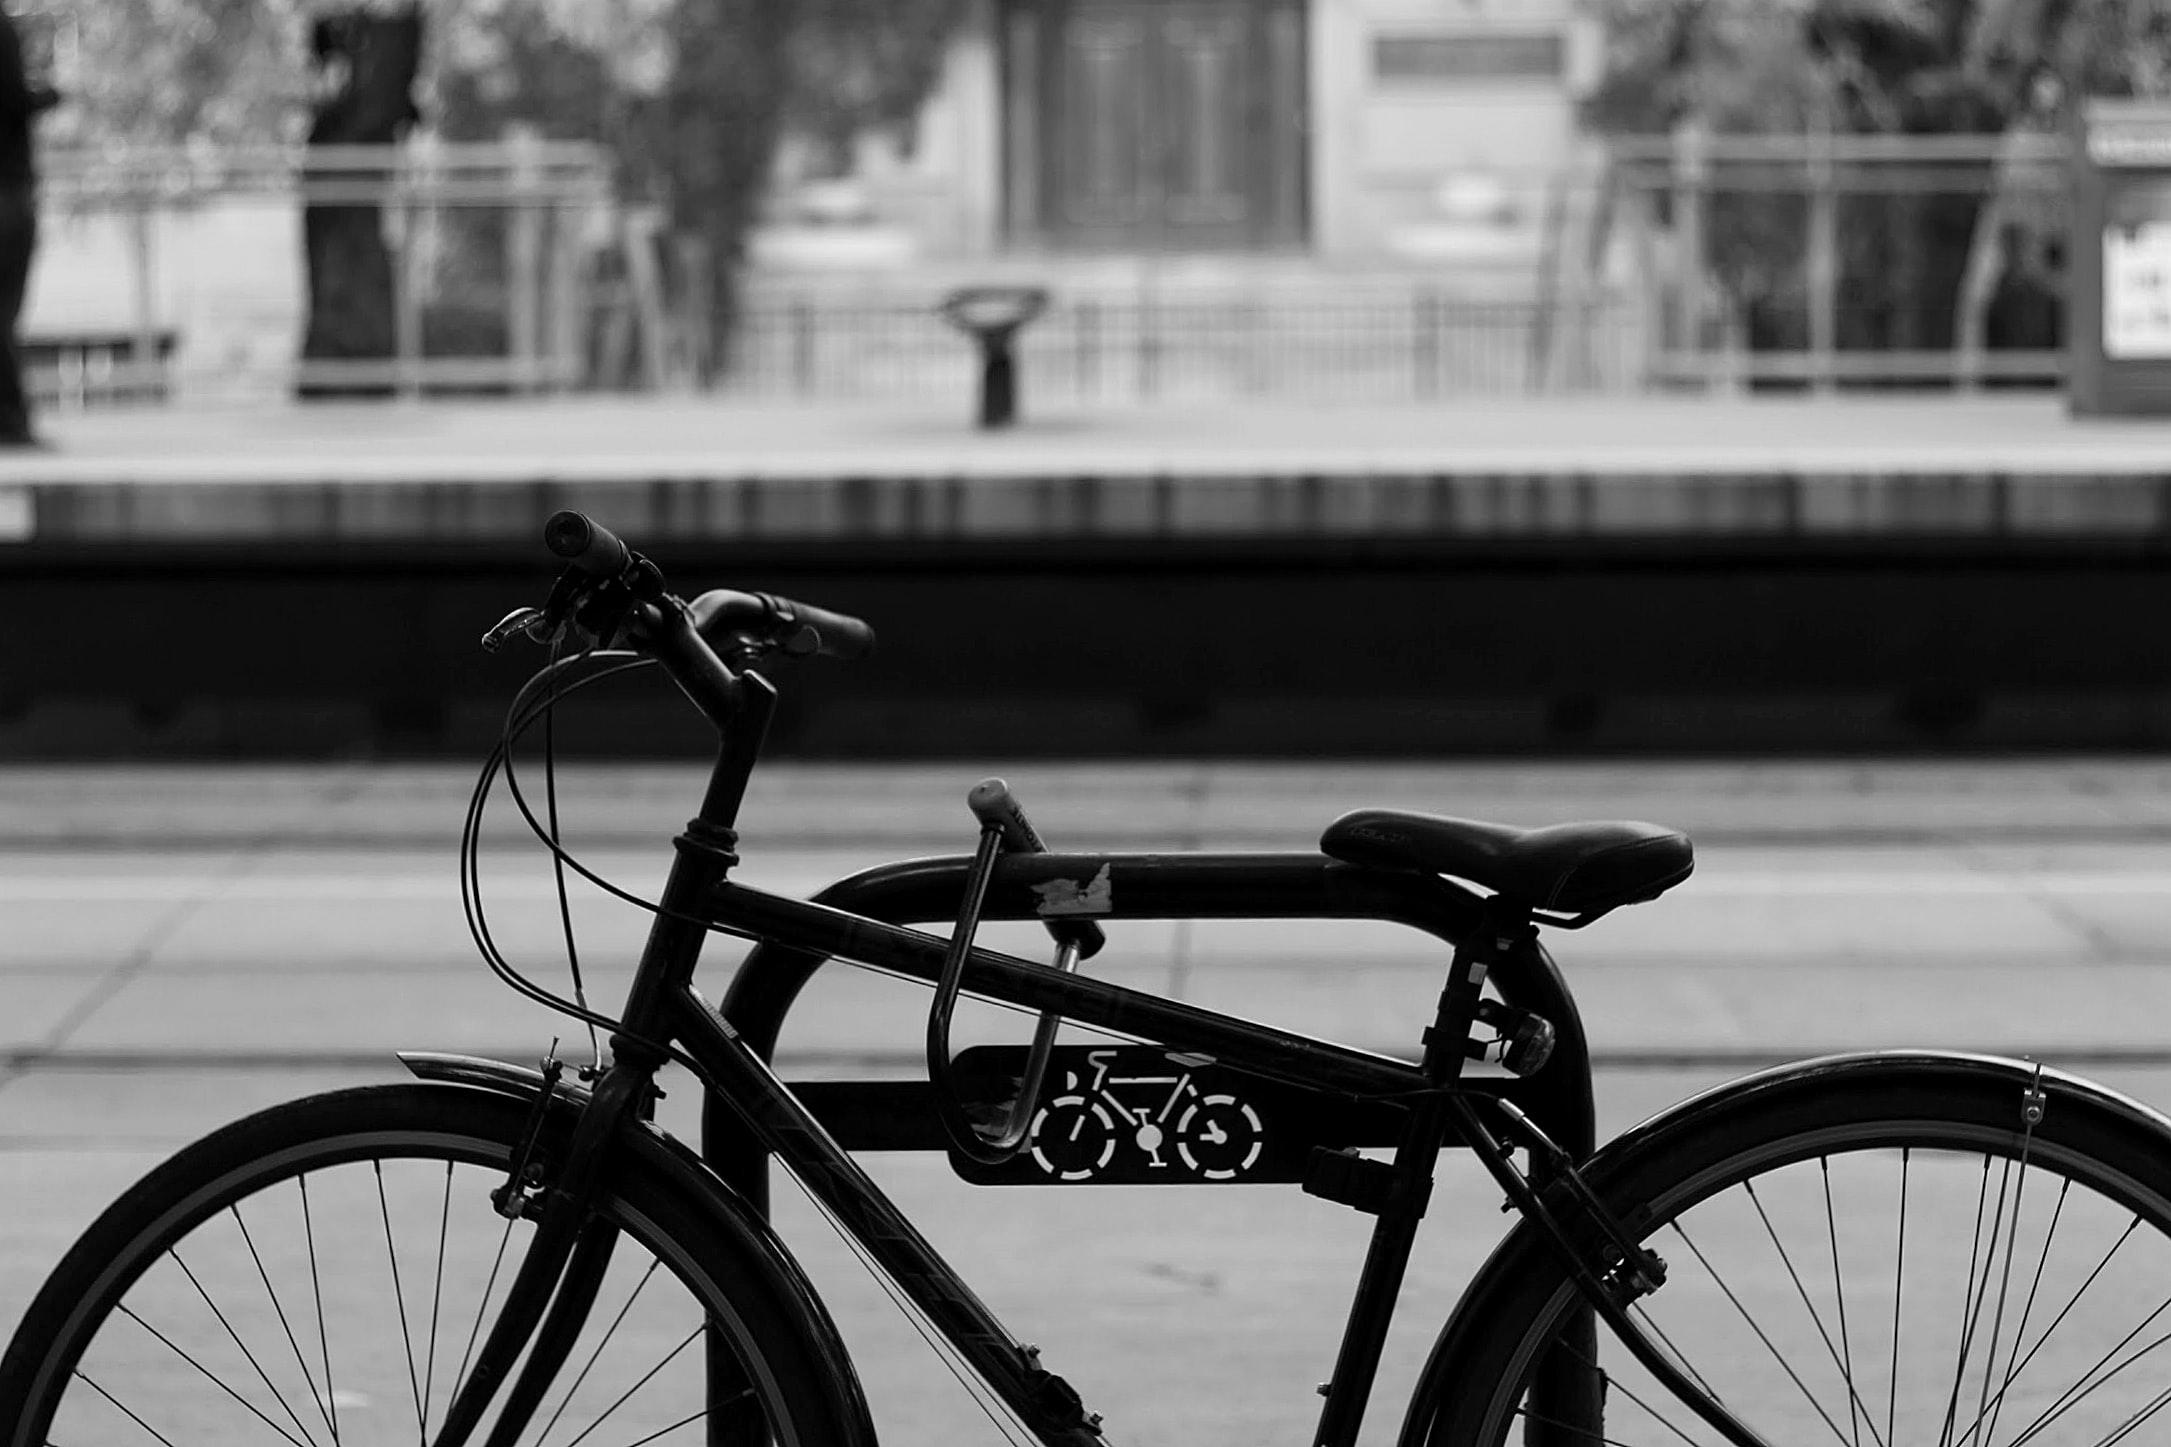 Attacher un vélo